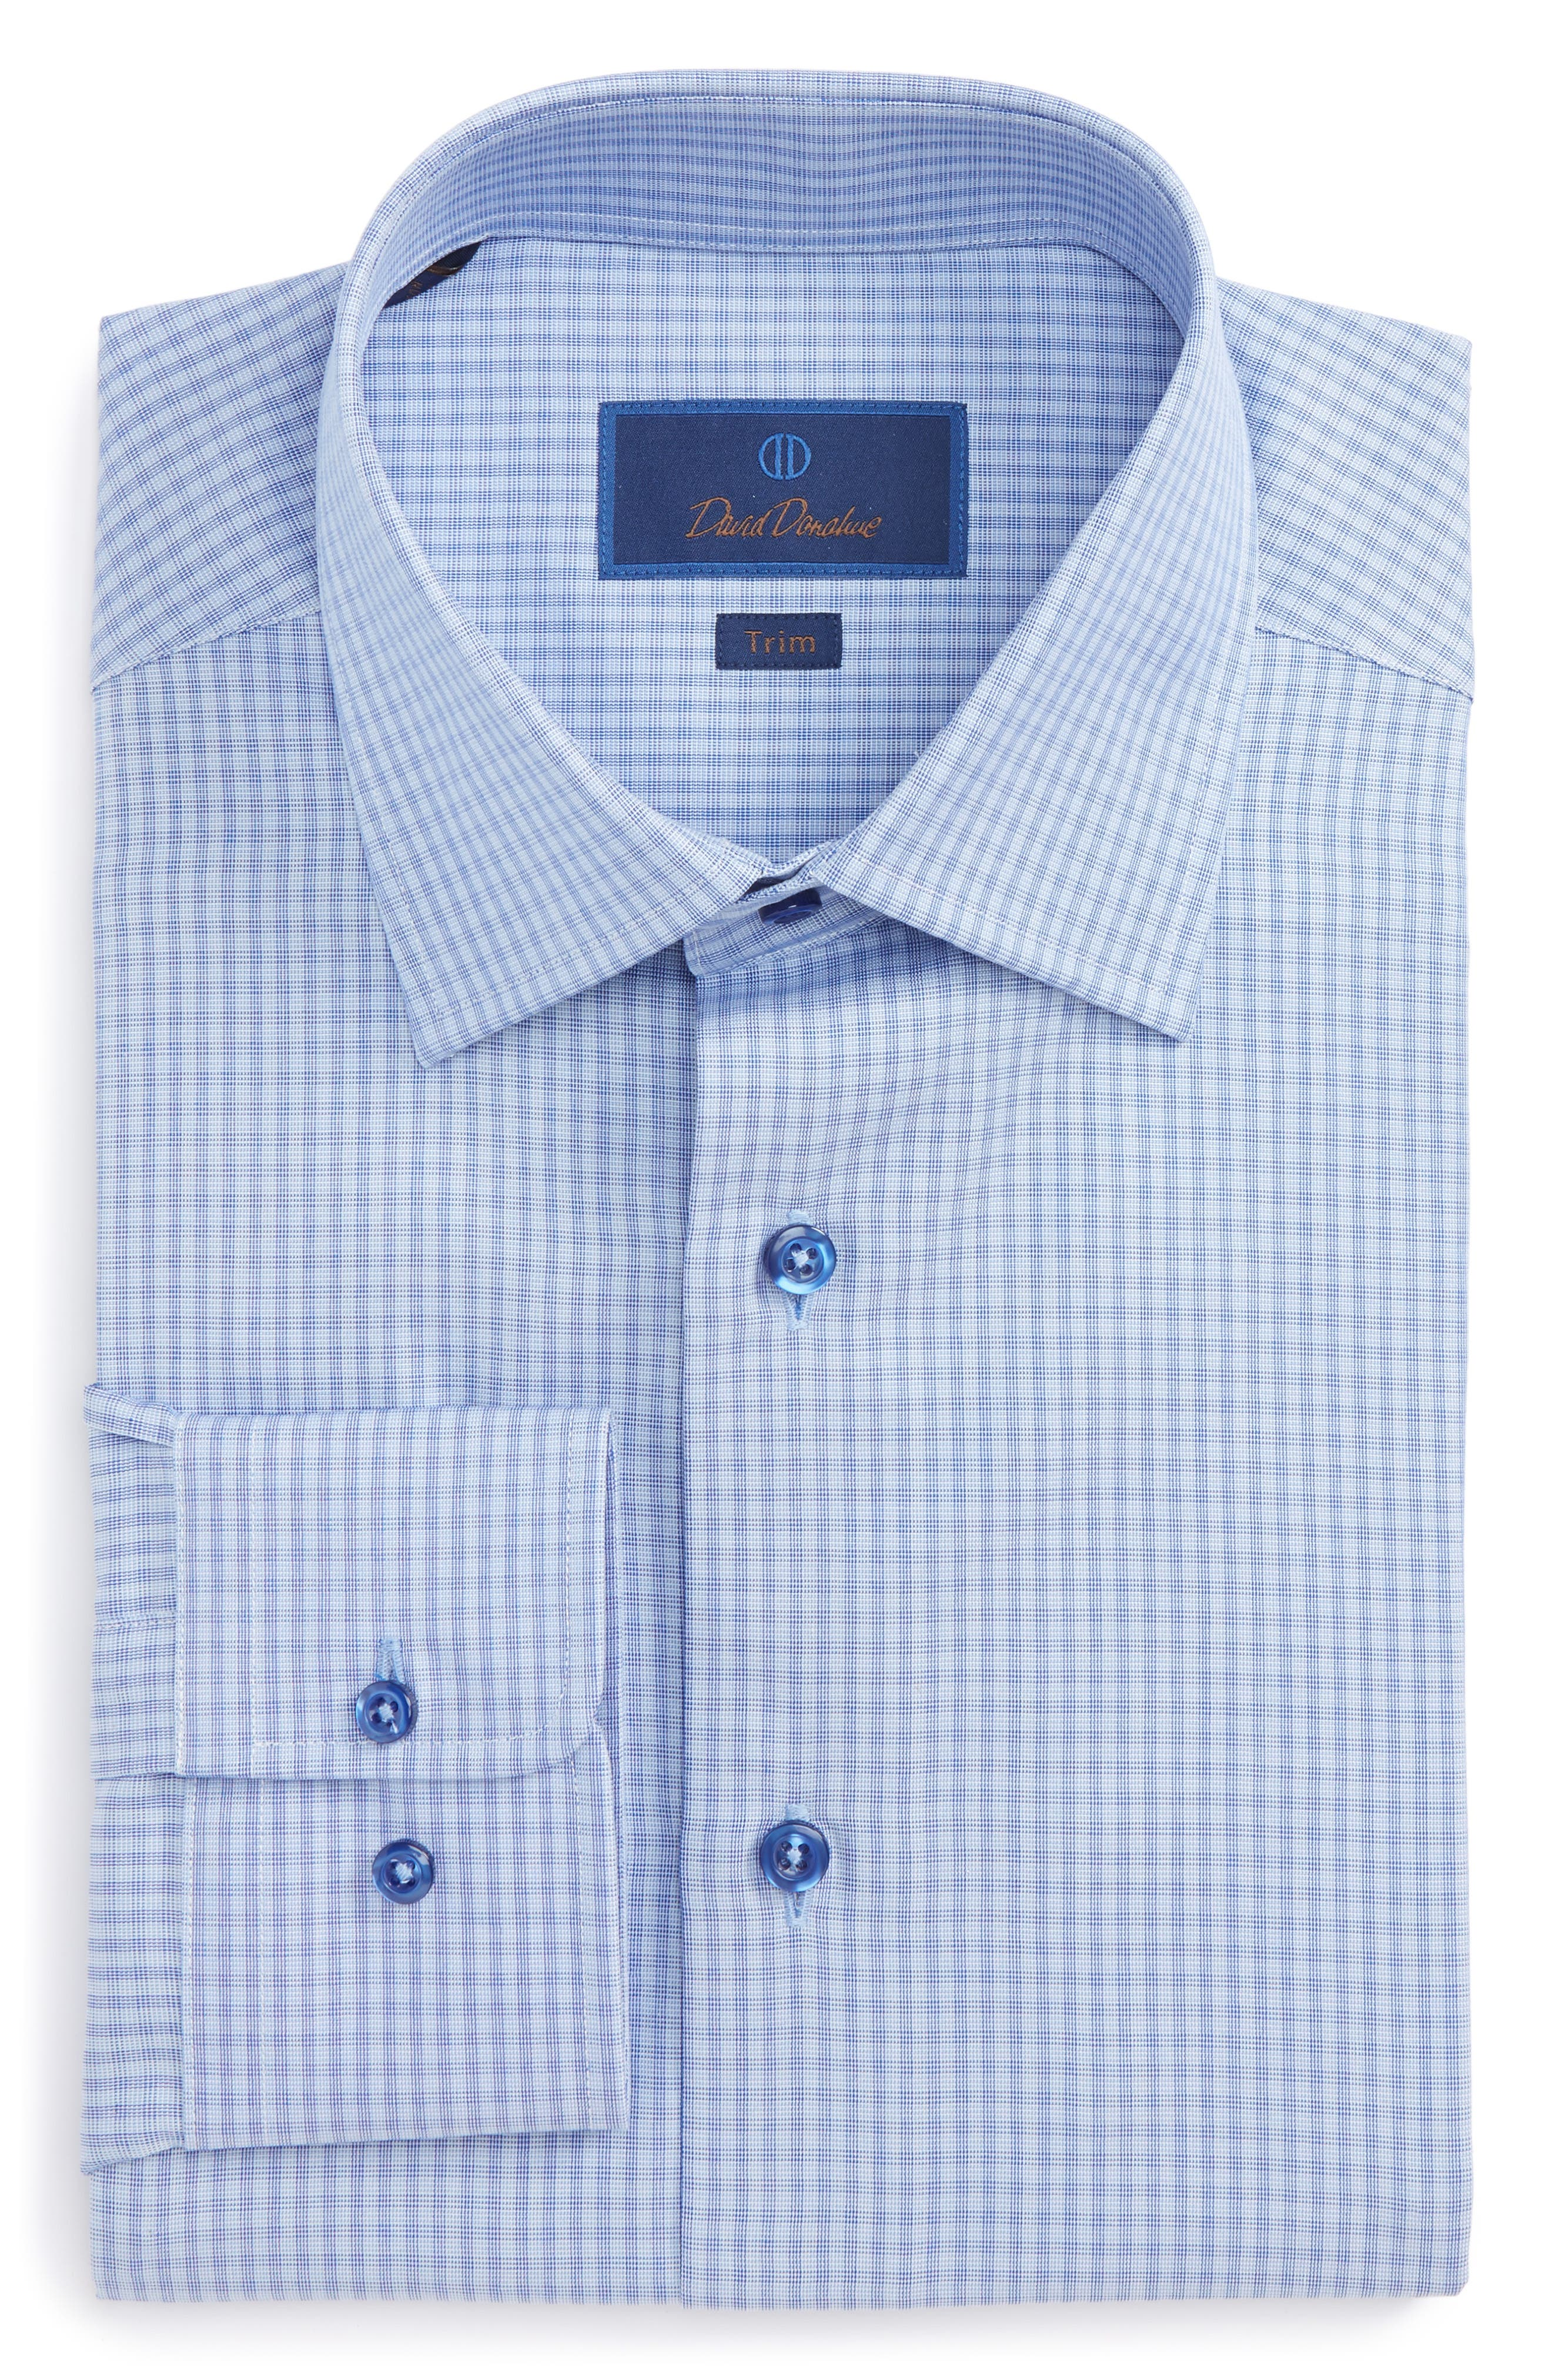 Alternate Image 1 Selected - David Donahue Trim Fit Check Dress Shirt